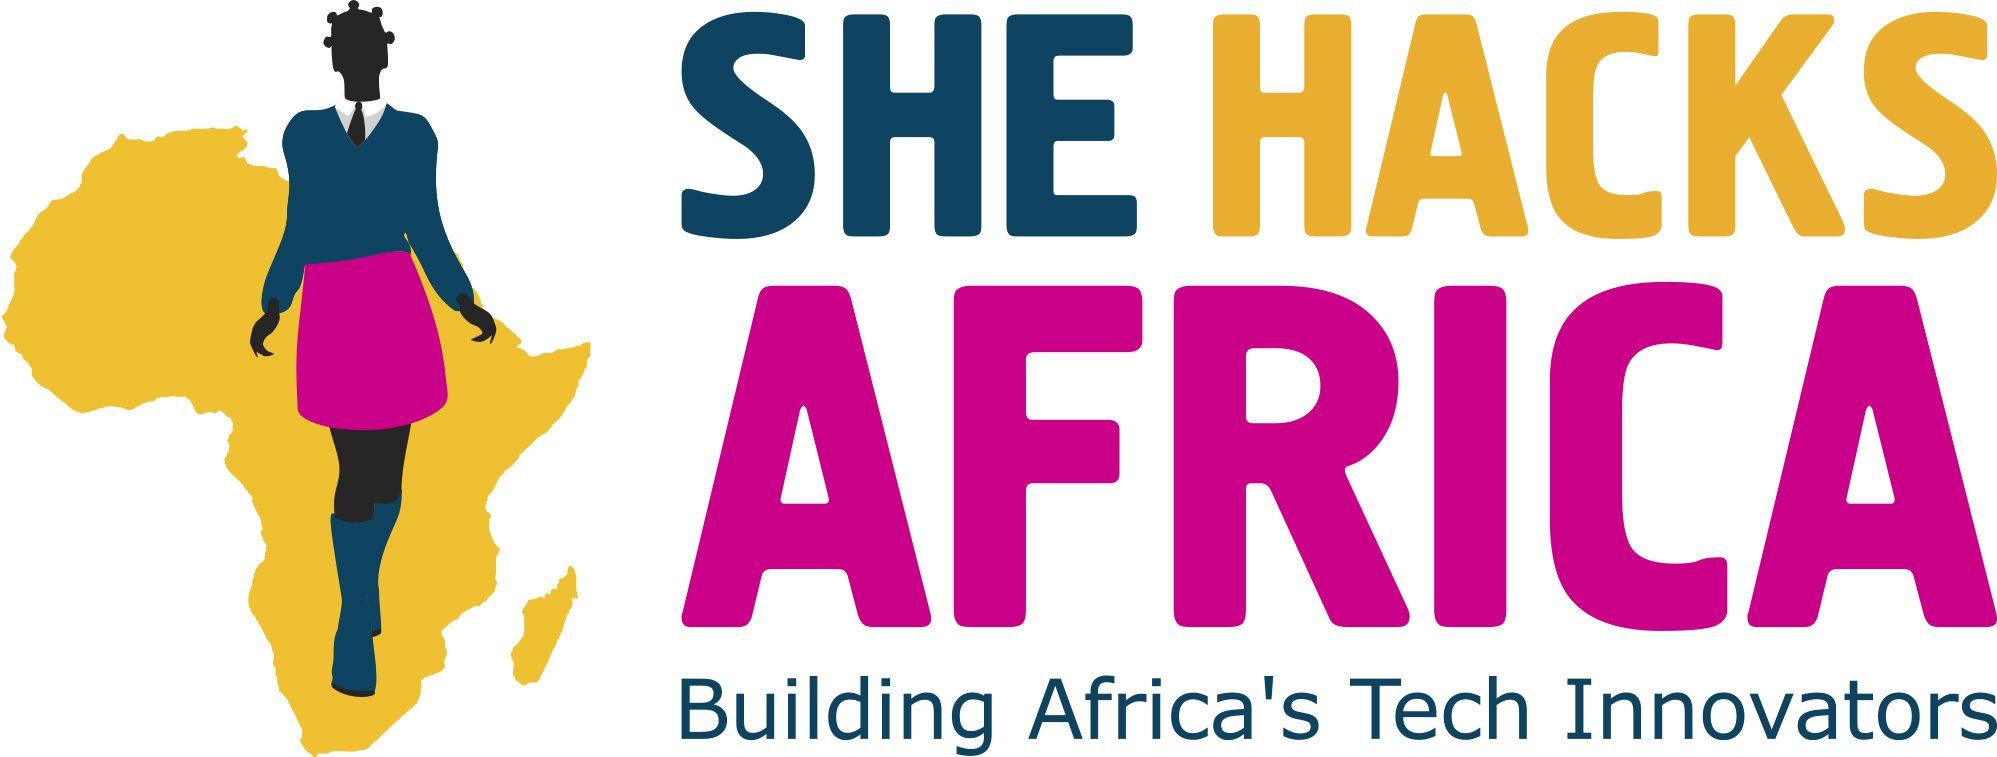 She Hacks Africa